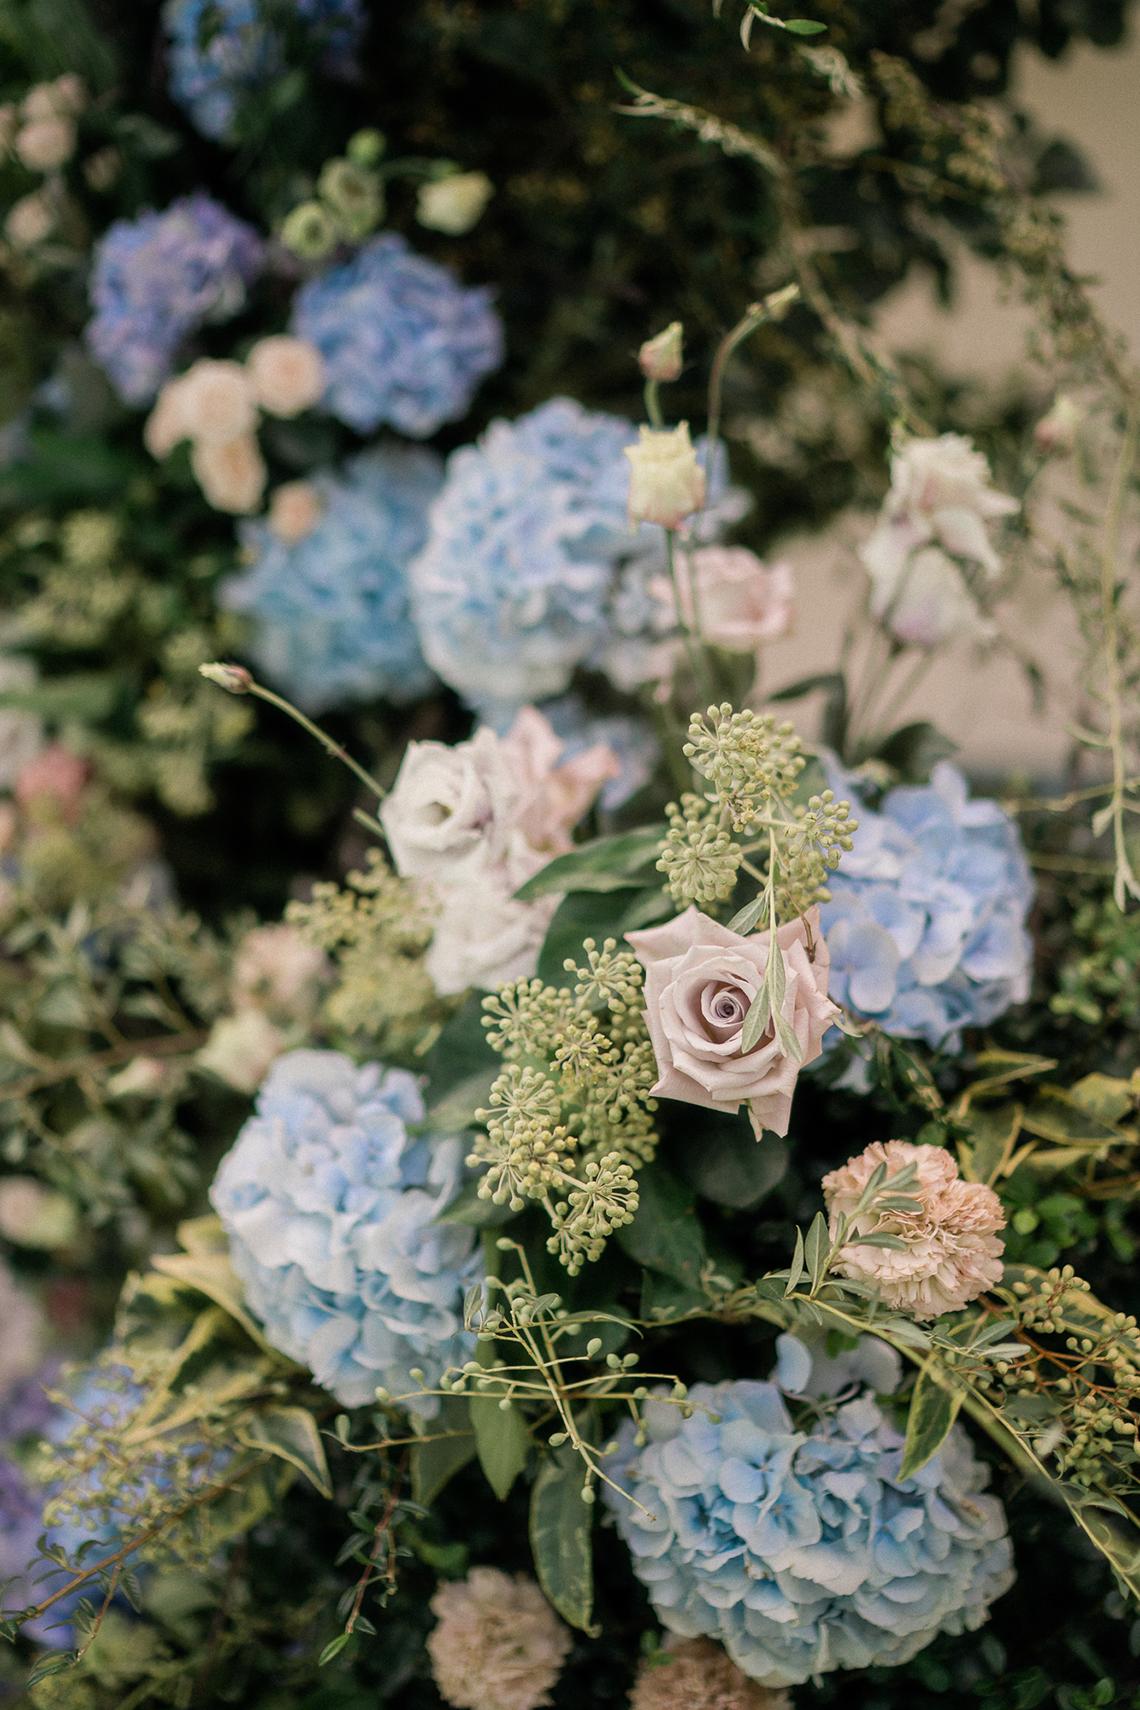 Romantic Something Blue Micro Wedding filled with Hydrangeas at Villa Ortensia in Lake Como – Alessandro Colle e Serena Rossi 21